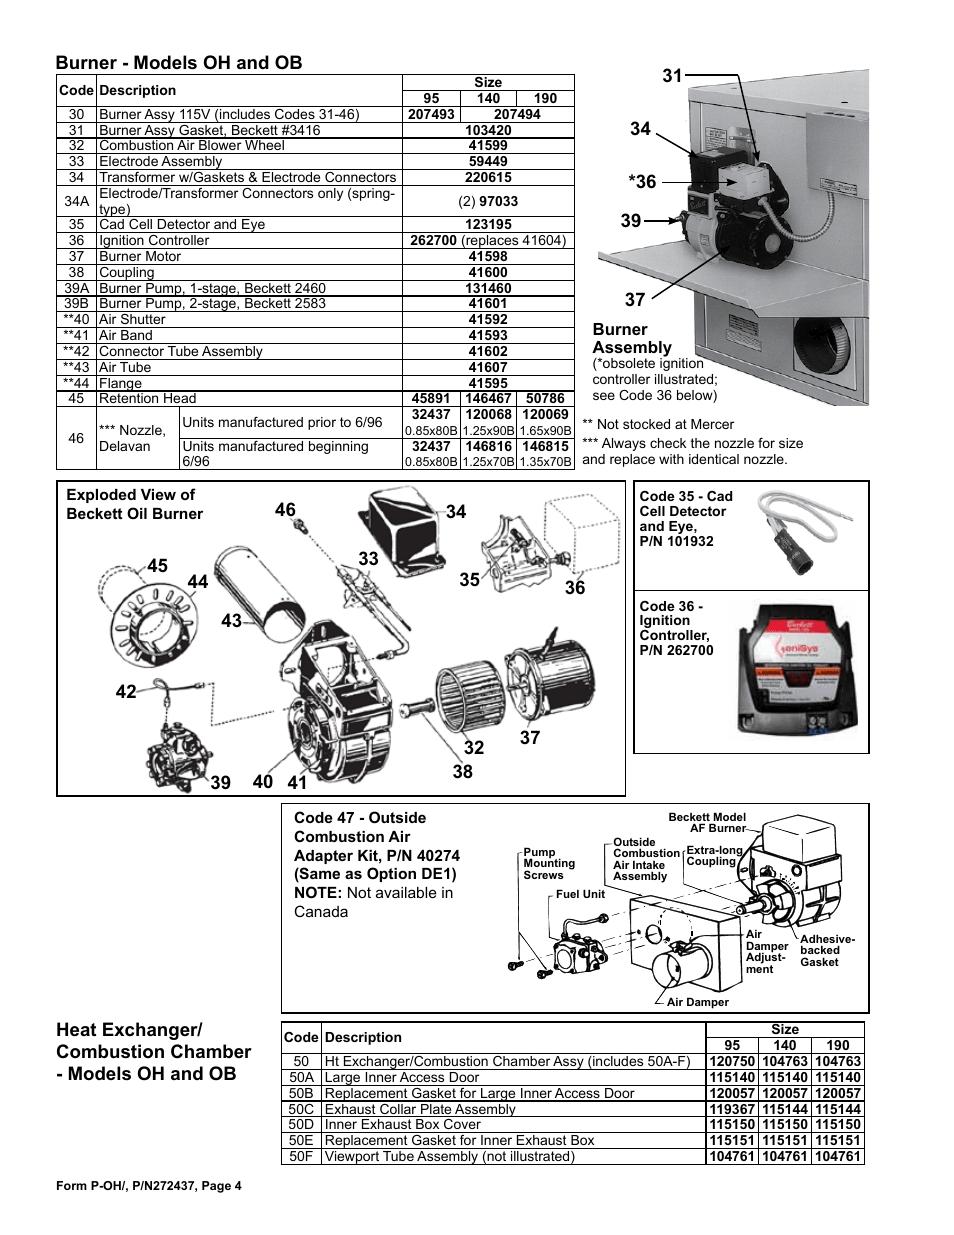 Reznor Gas Fired Heater Wiring Diagram Mini Usb Wiring